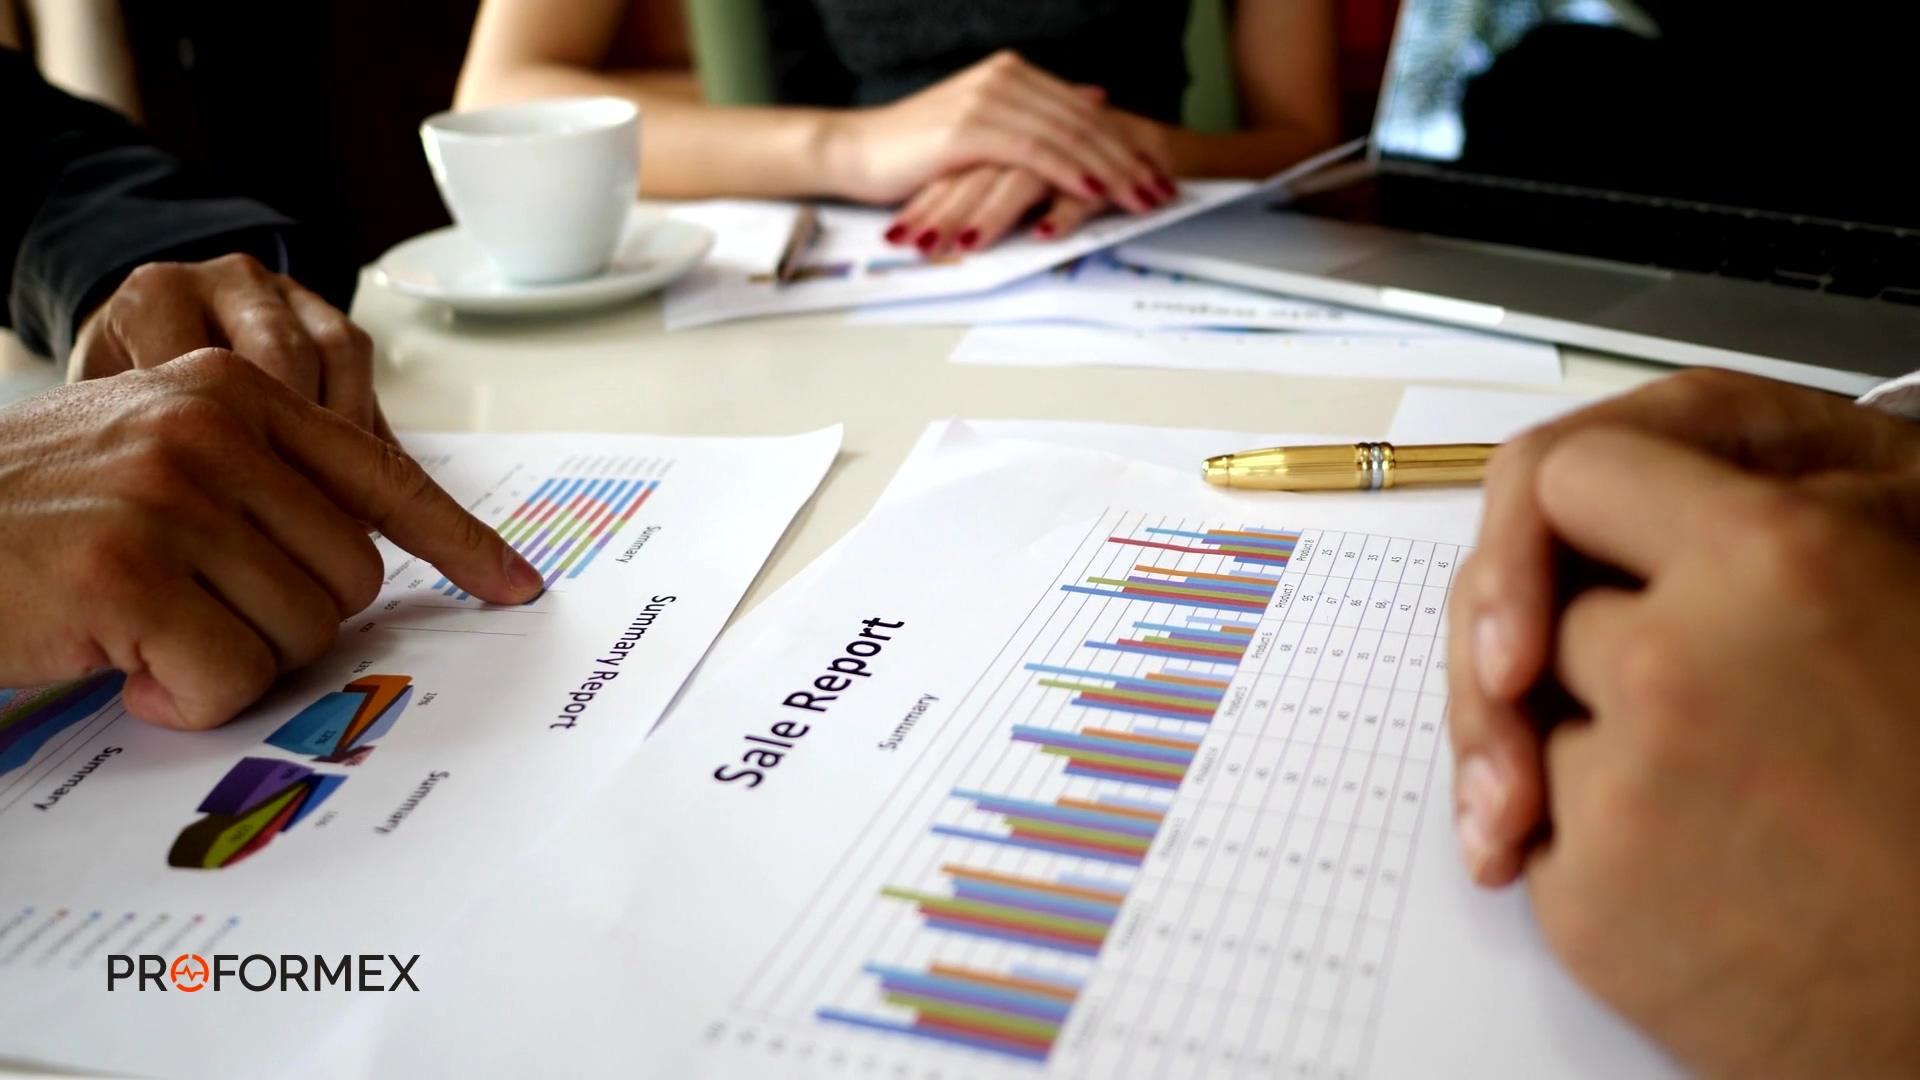 Proformex - Data and Analytics.mov